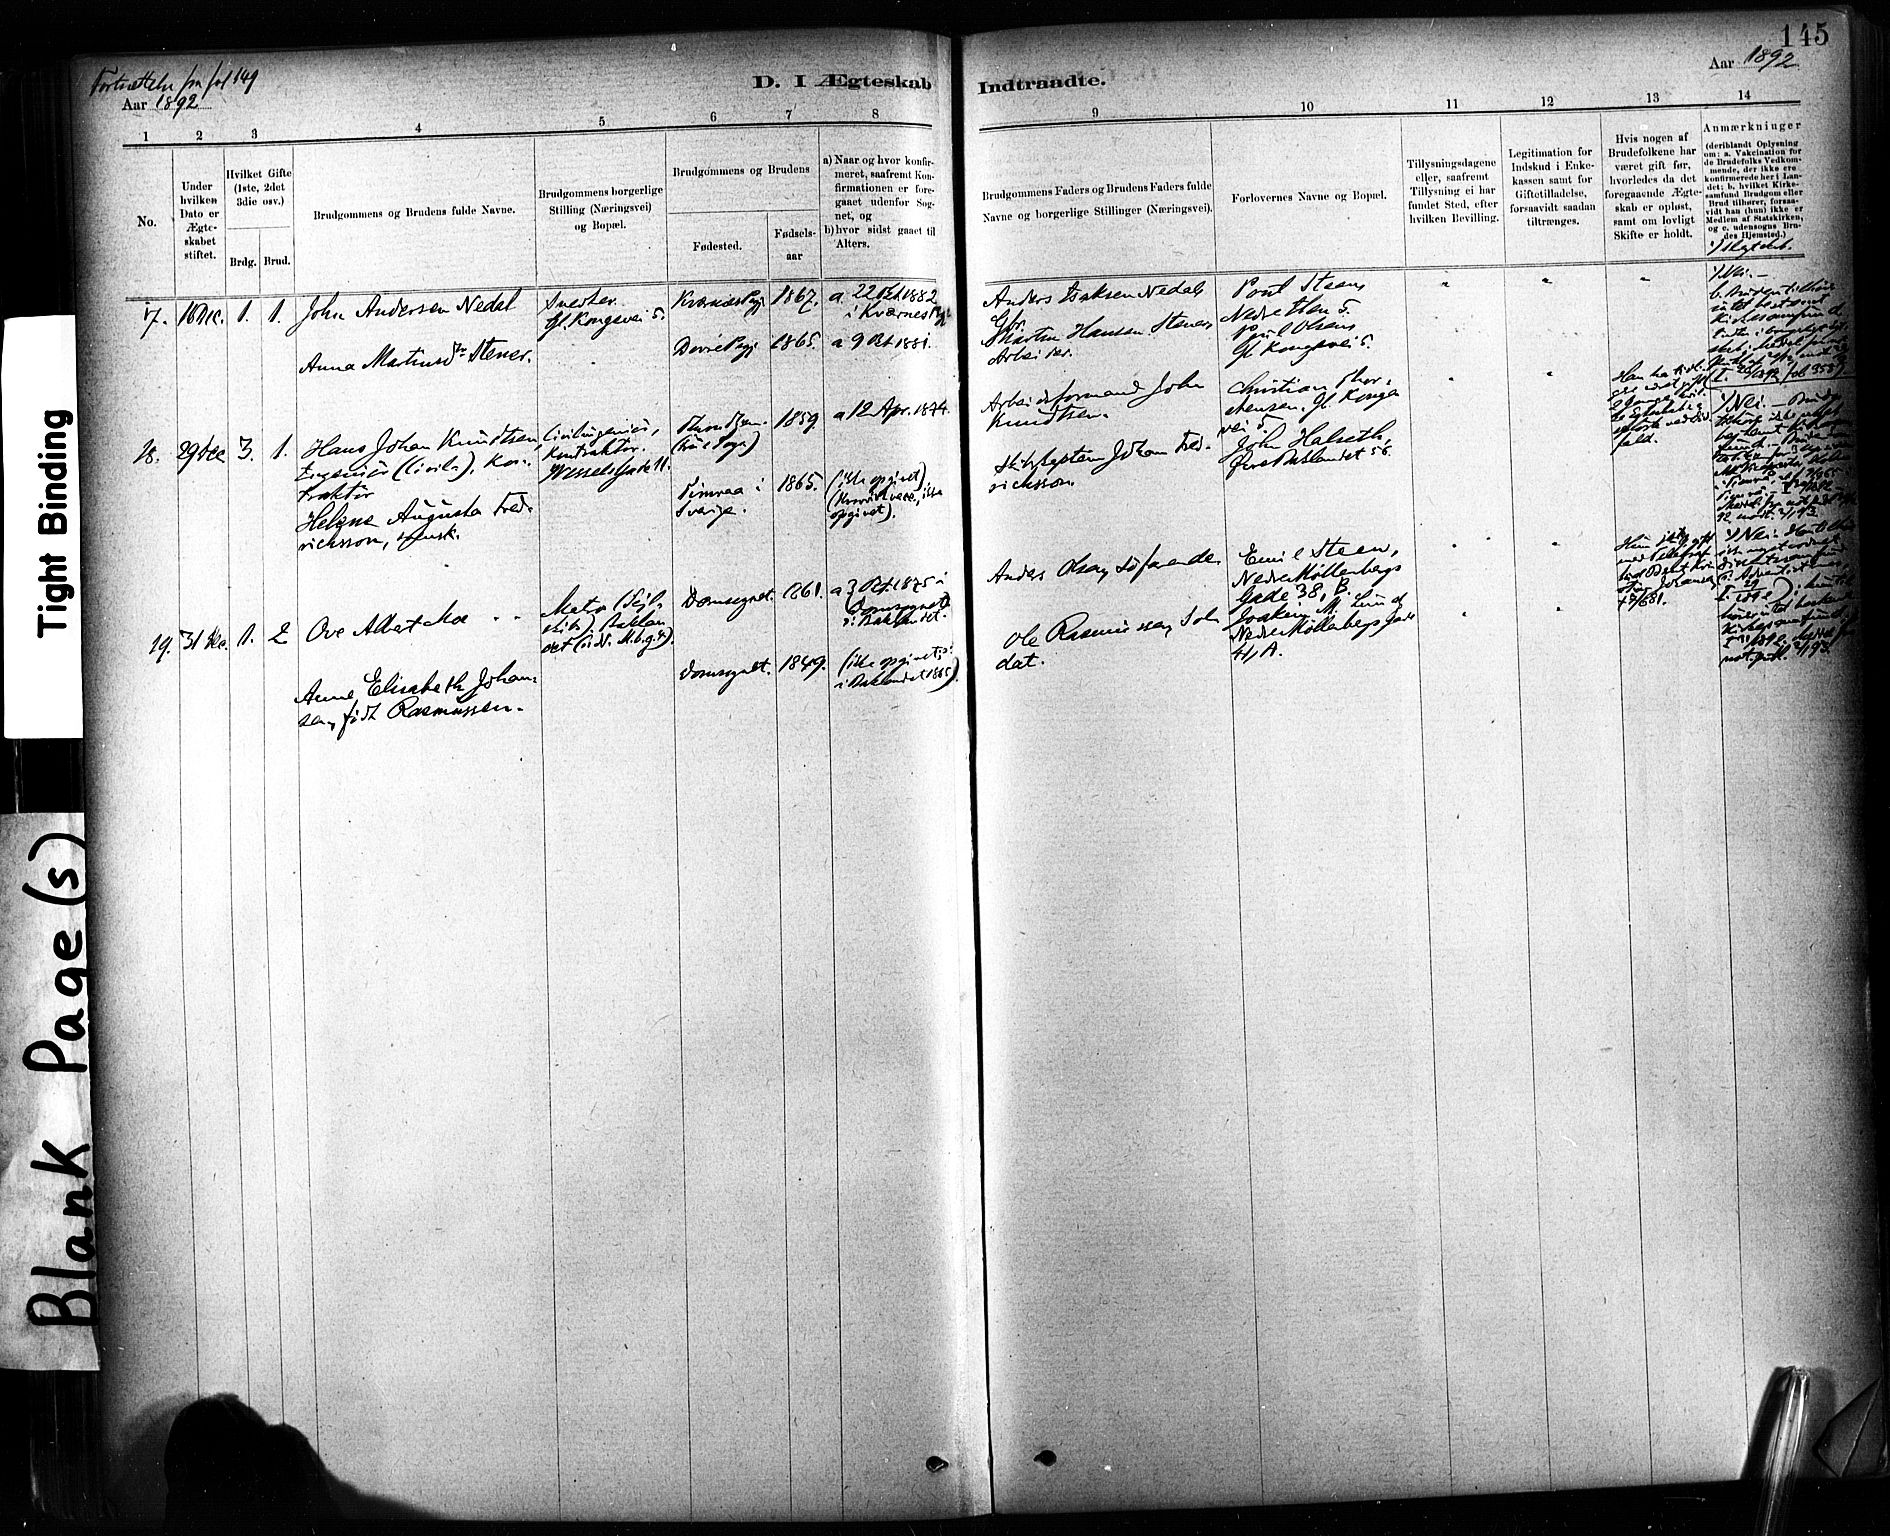 SAT, Ministerialprotokoller, klokkerbøker og fødselsregistre - Sør-Trøndelag, 604/L0189: Parish register (official) no. 604A10, 1878-1892, p. 145